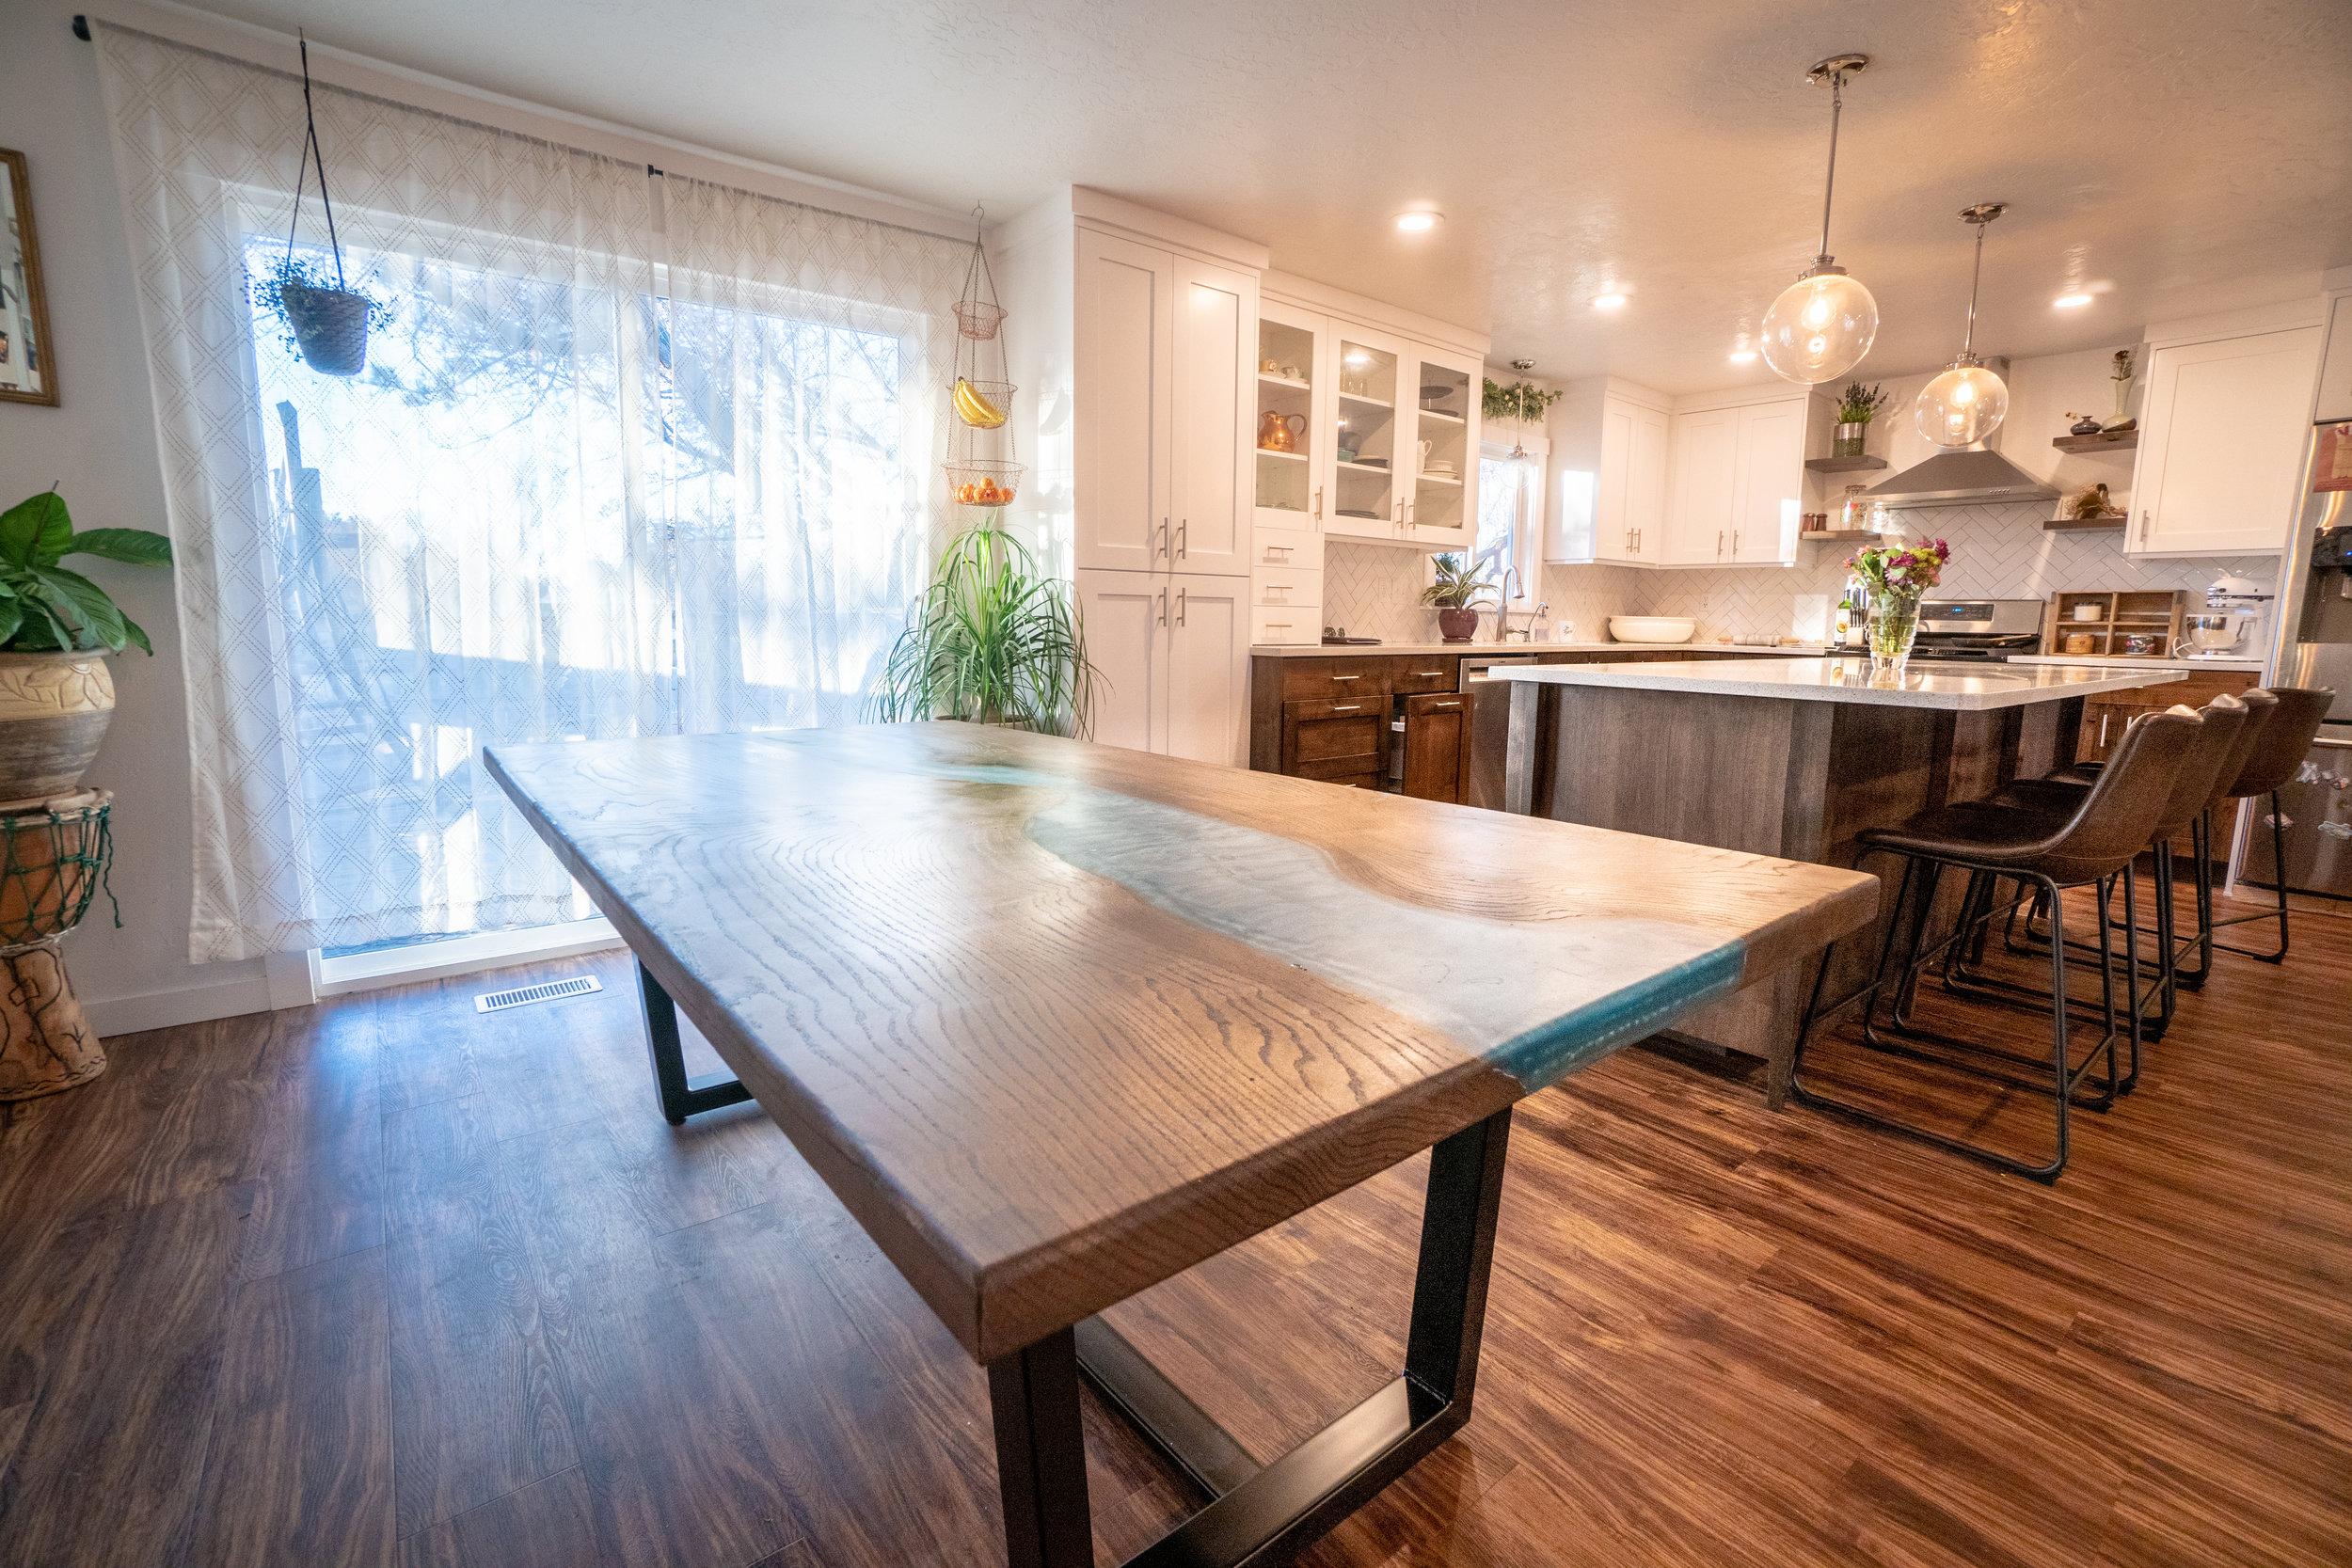 river-table-boise-idaho-custom-woodworking.jpg